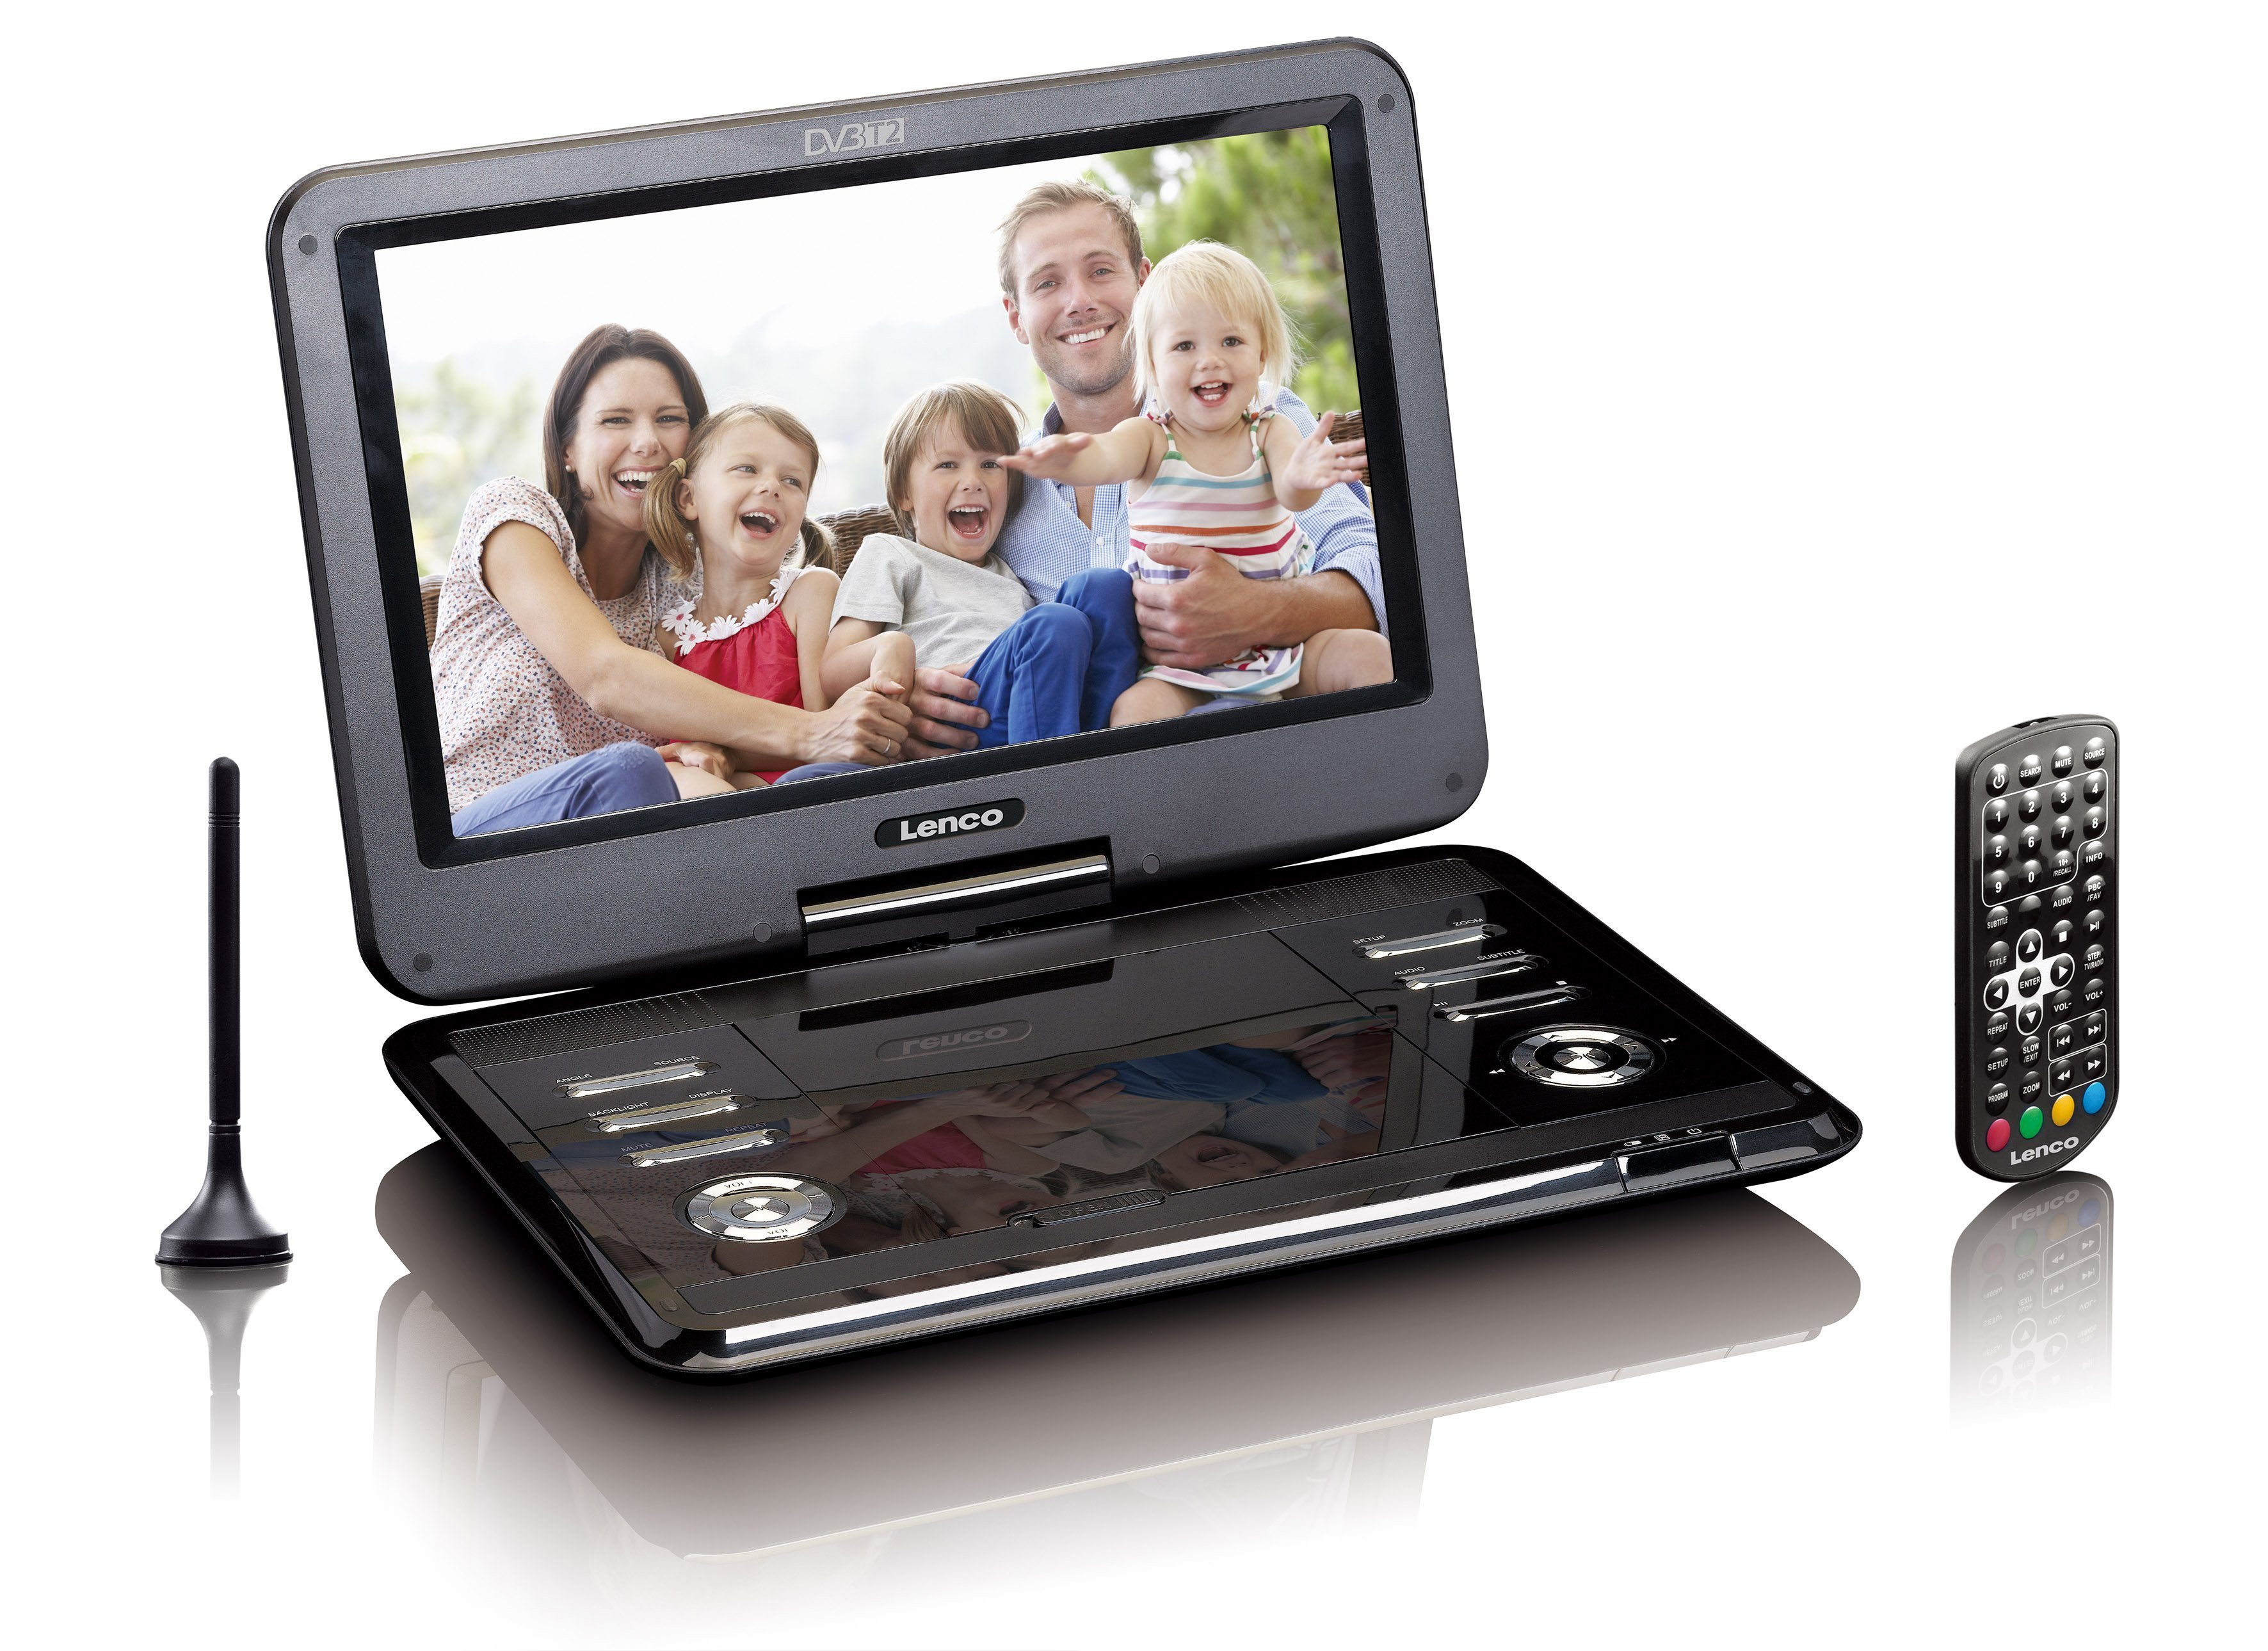 Lenco Tragbarer 11,6-Zoll DVD-Player mit DVB-T2, USB, SD »DVP-1273«